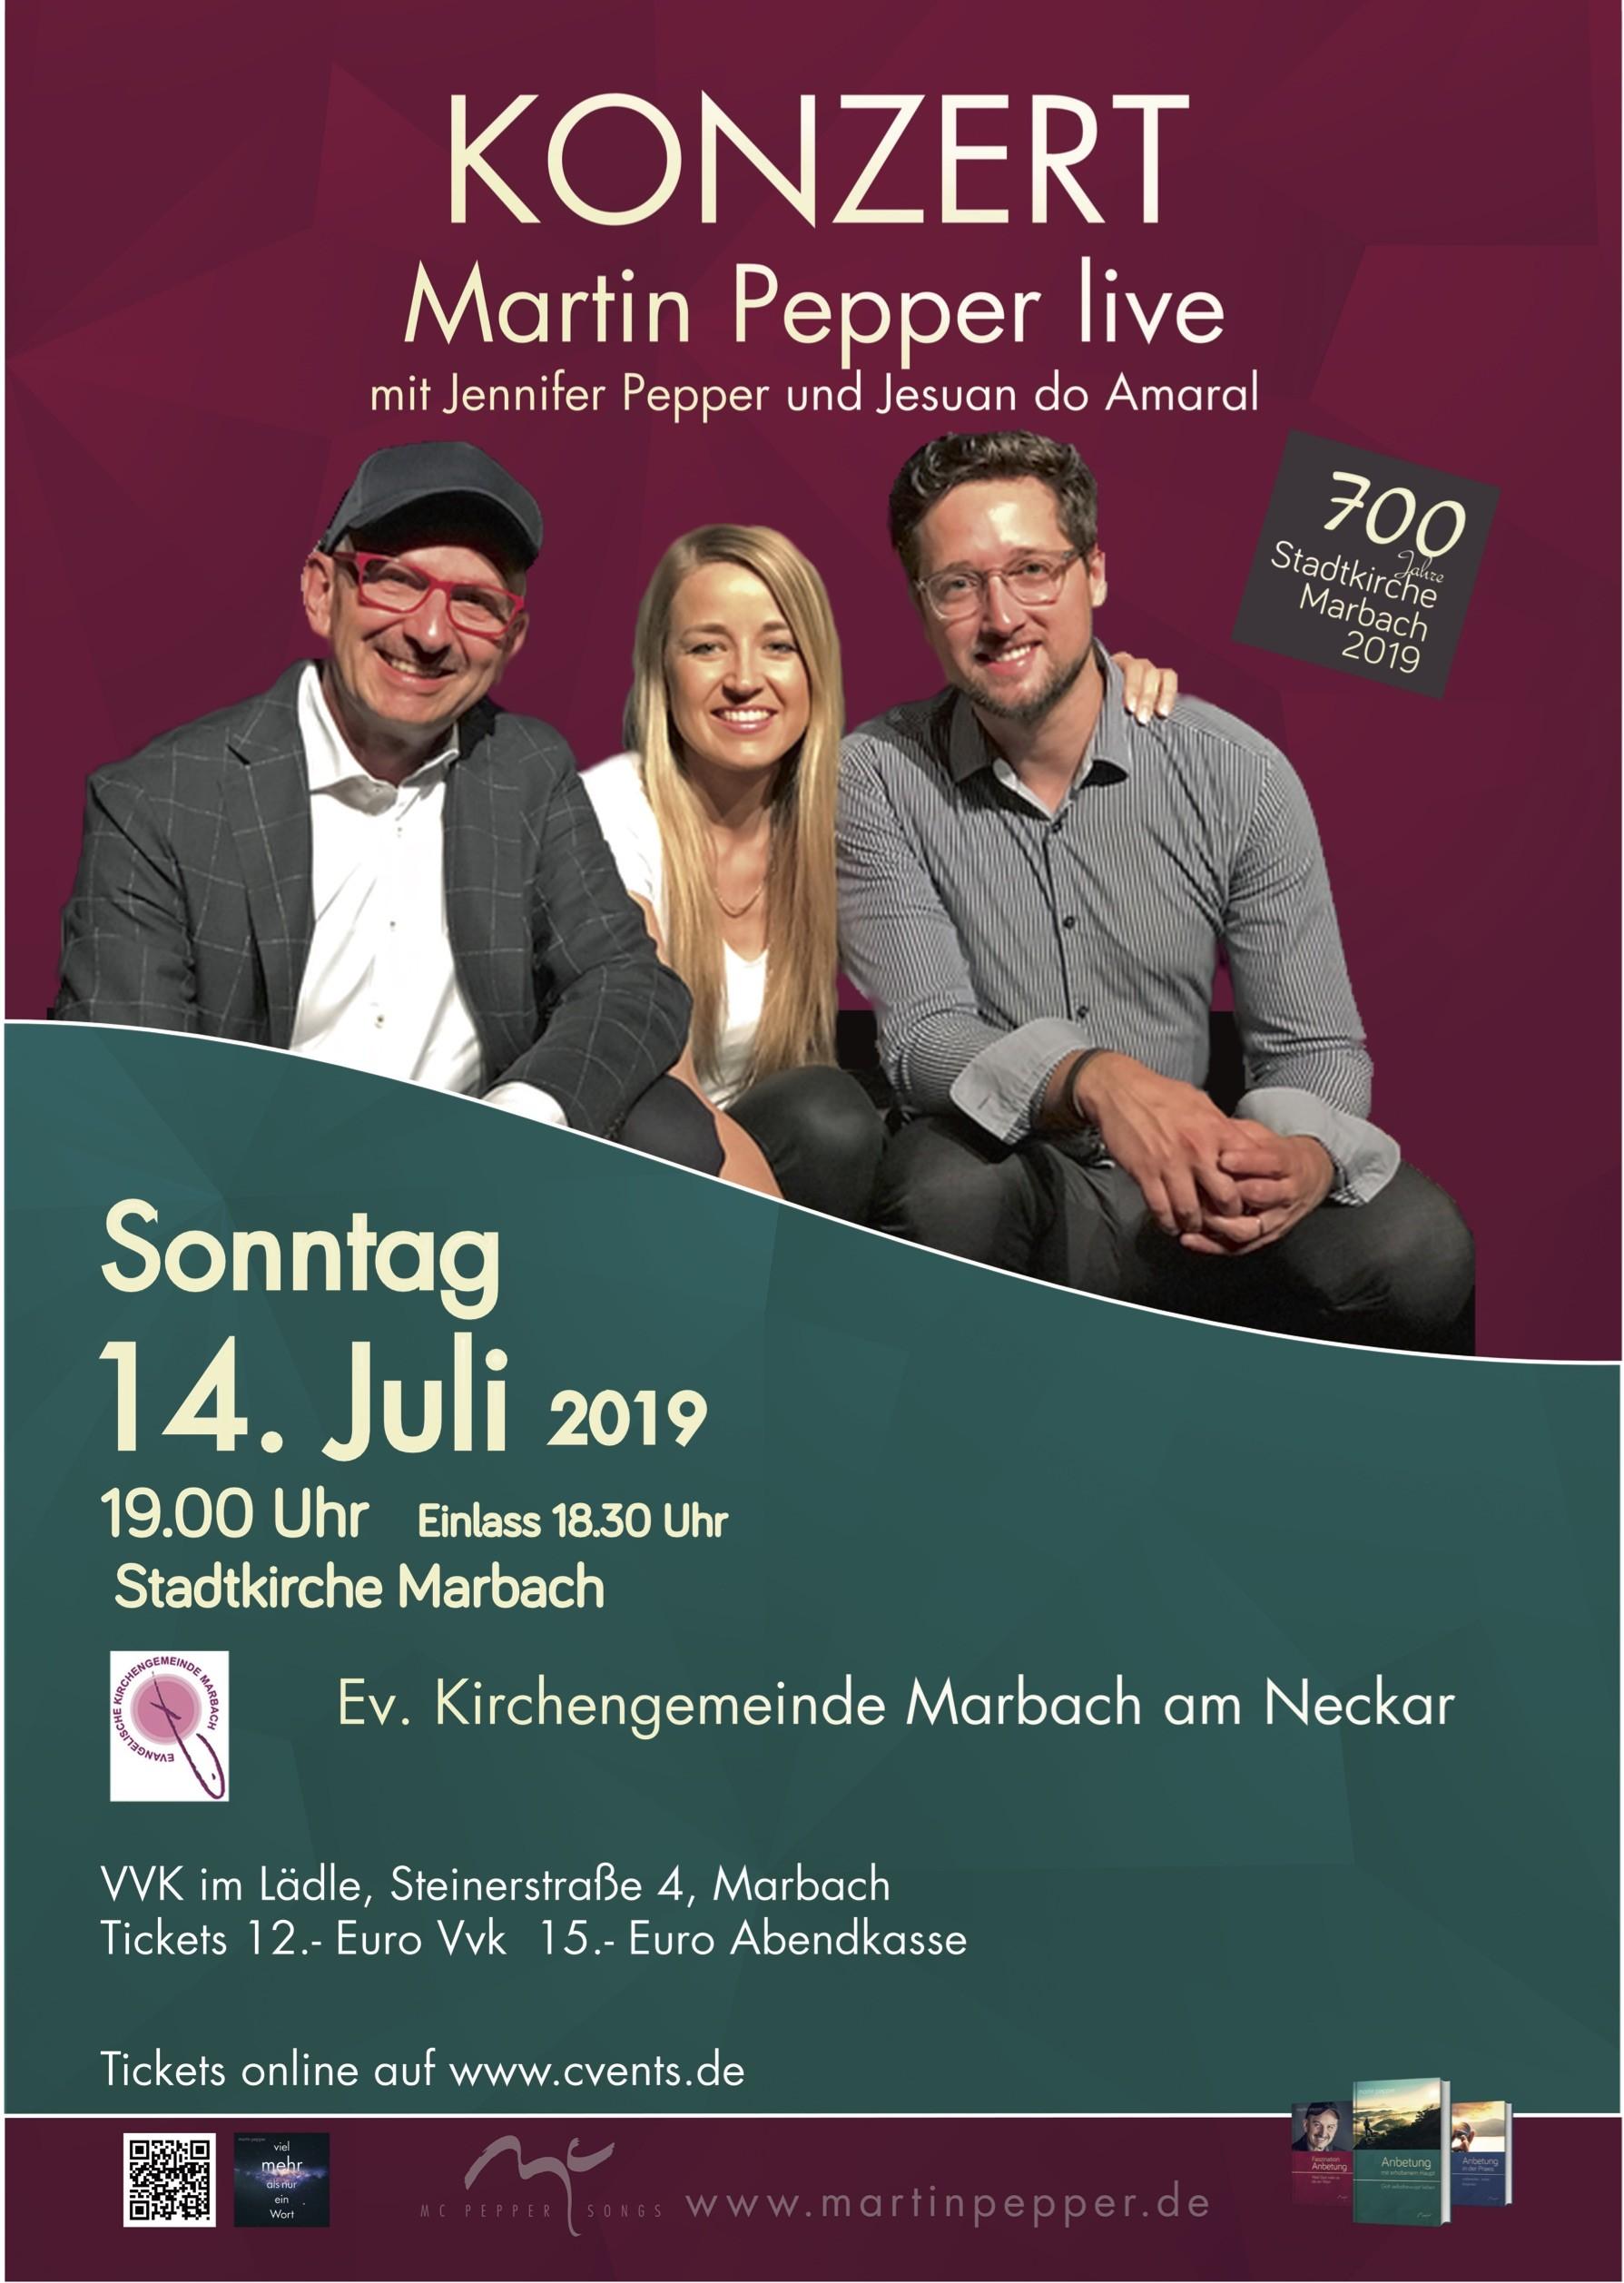 Martin Pepper live in Marbach am Neckar